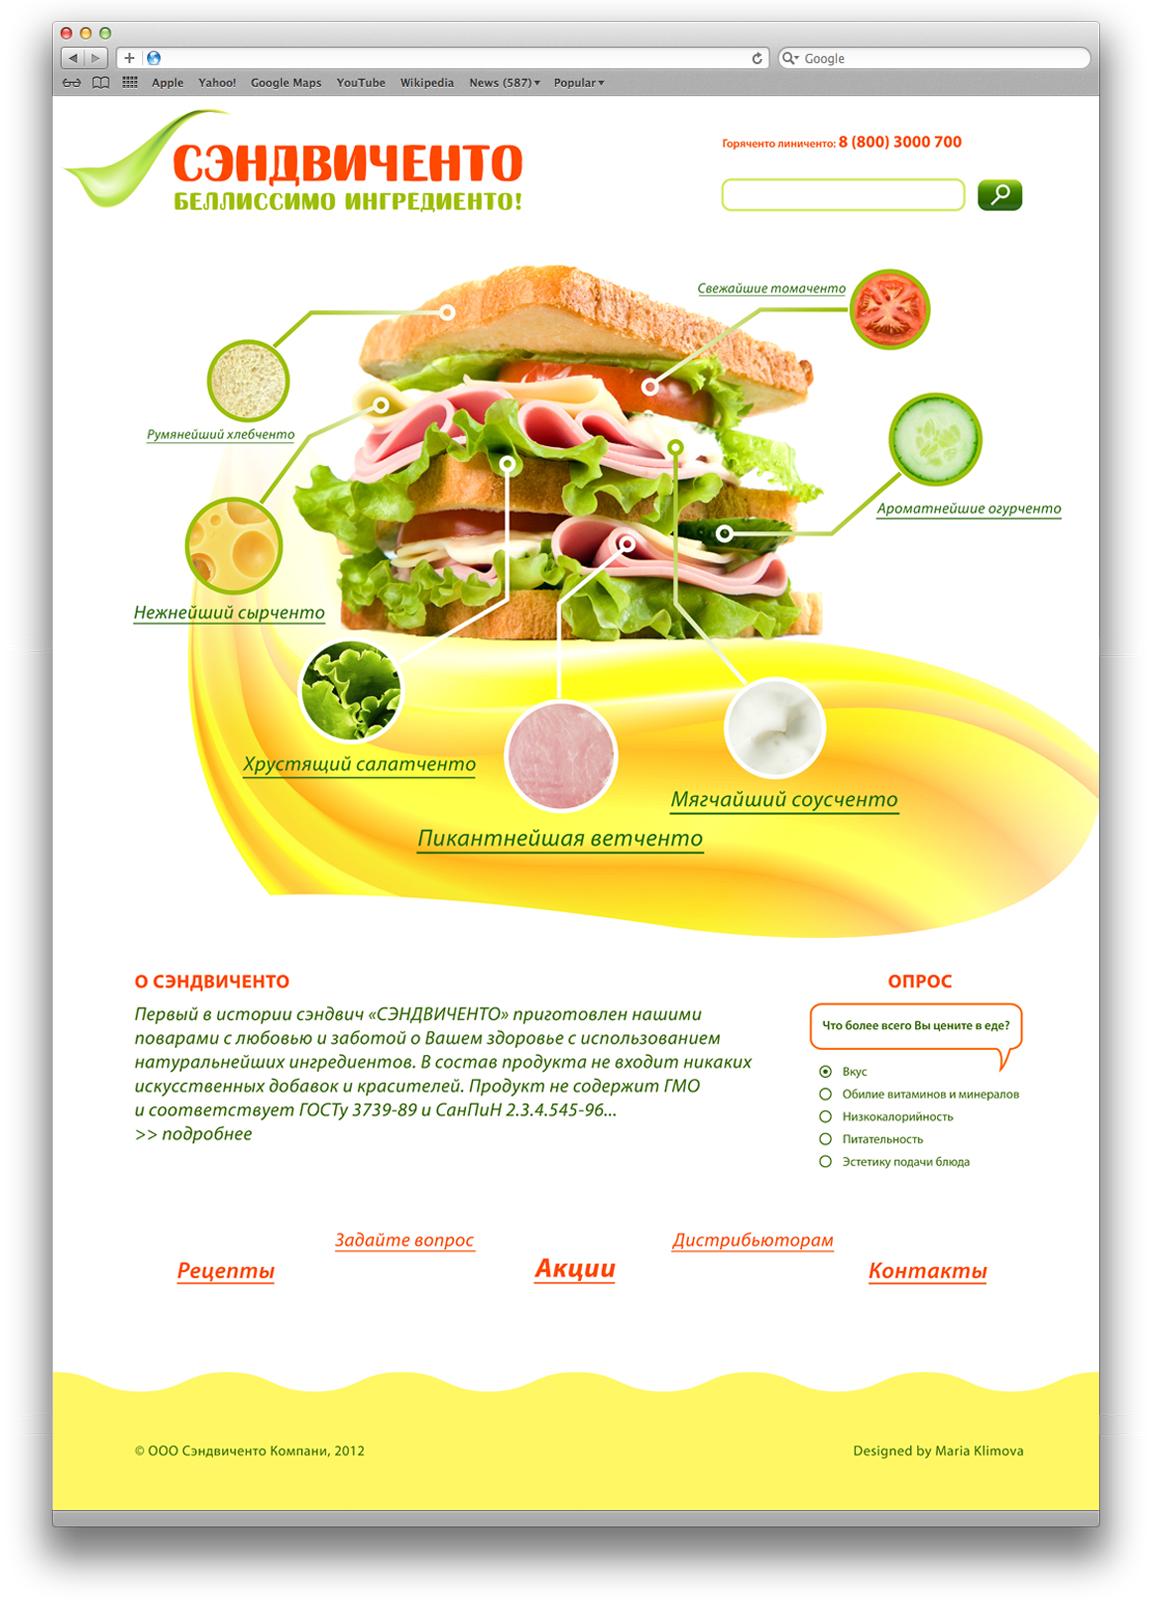 Промо сайт сэндвича «Сэндвиченто»